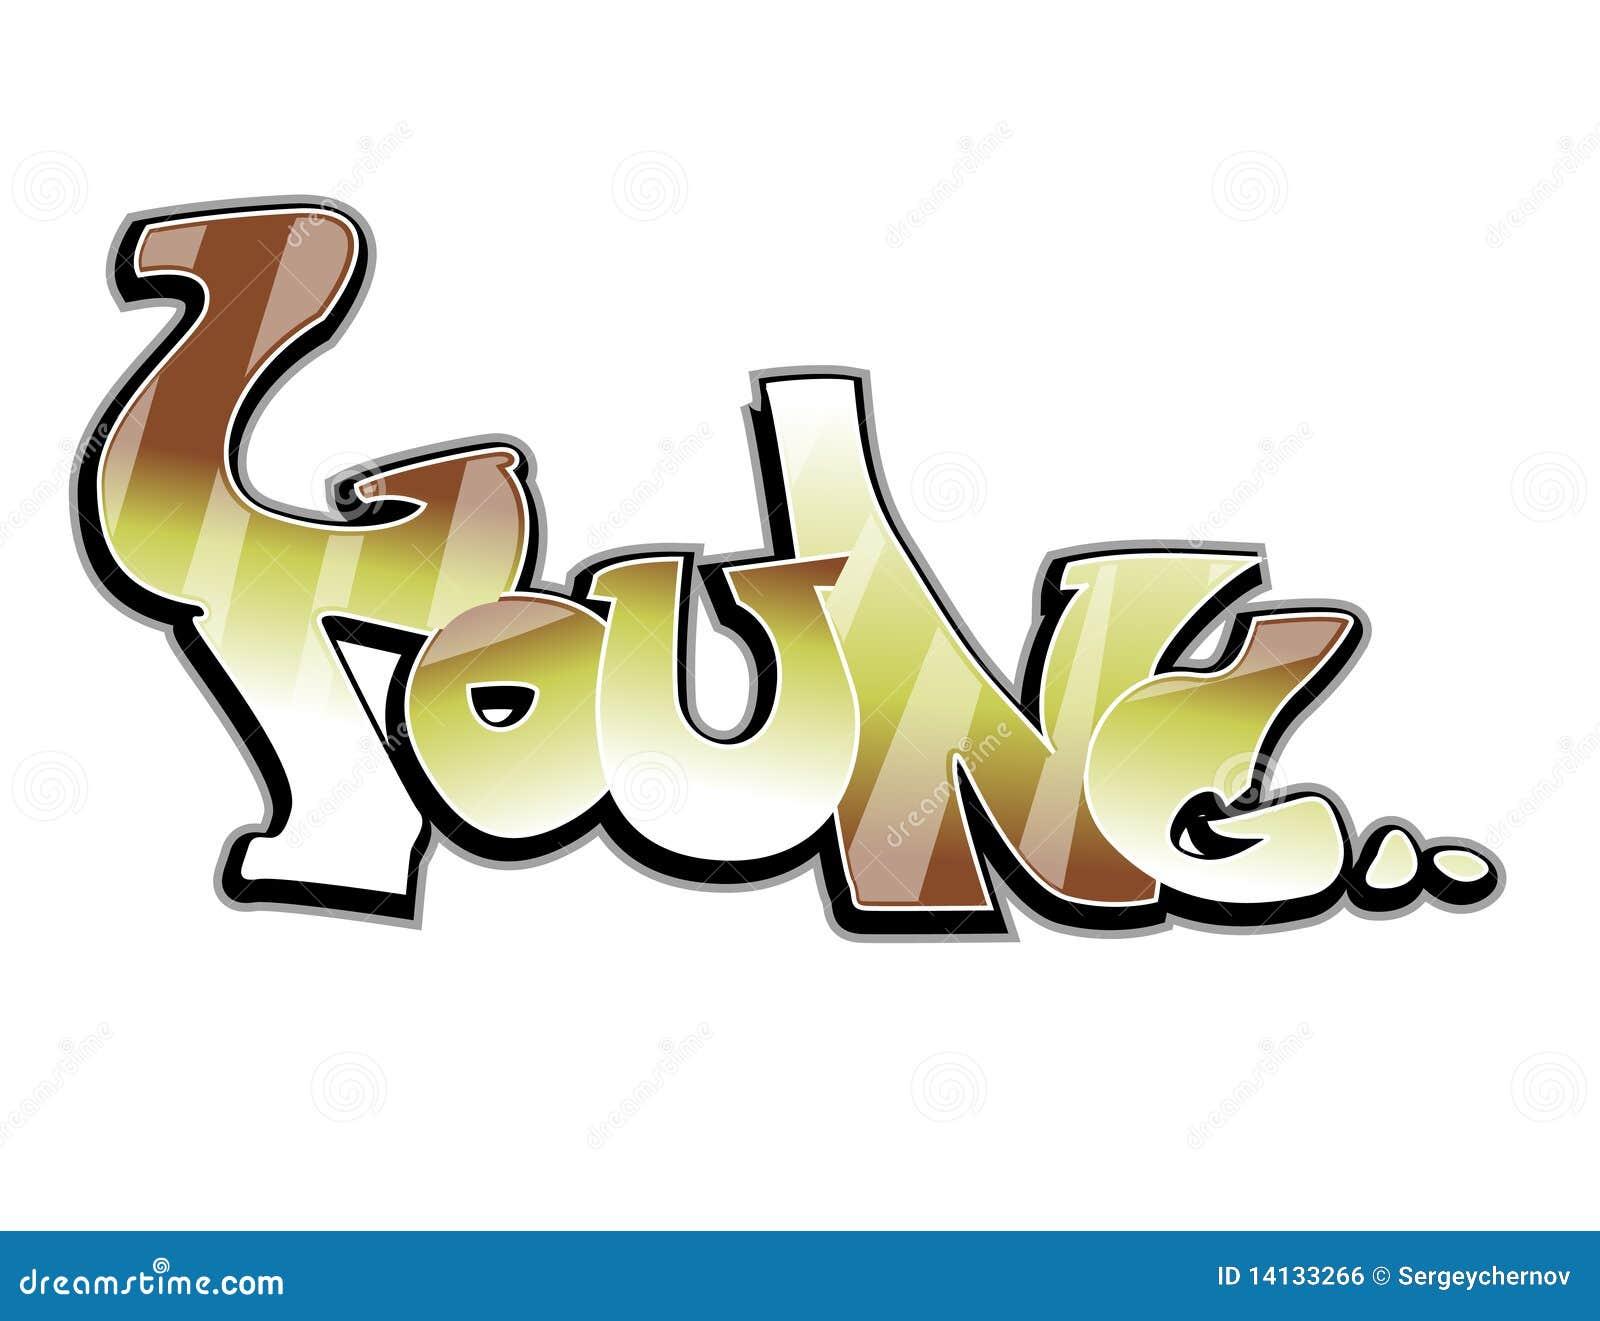 Graffiti art design - Graffiti Art Design Young Royalty Free Stock Image